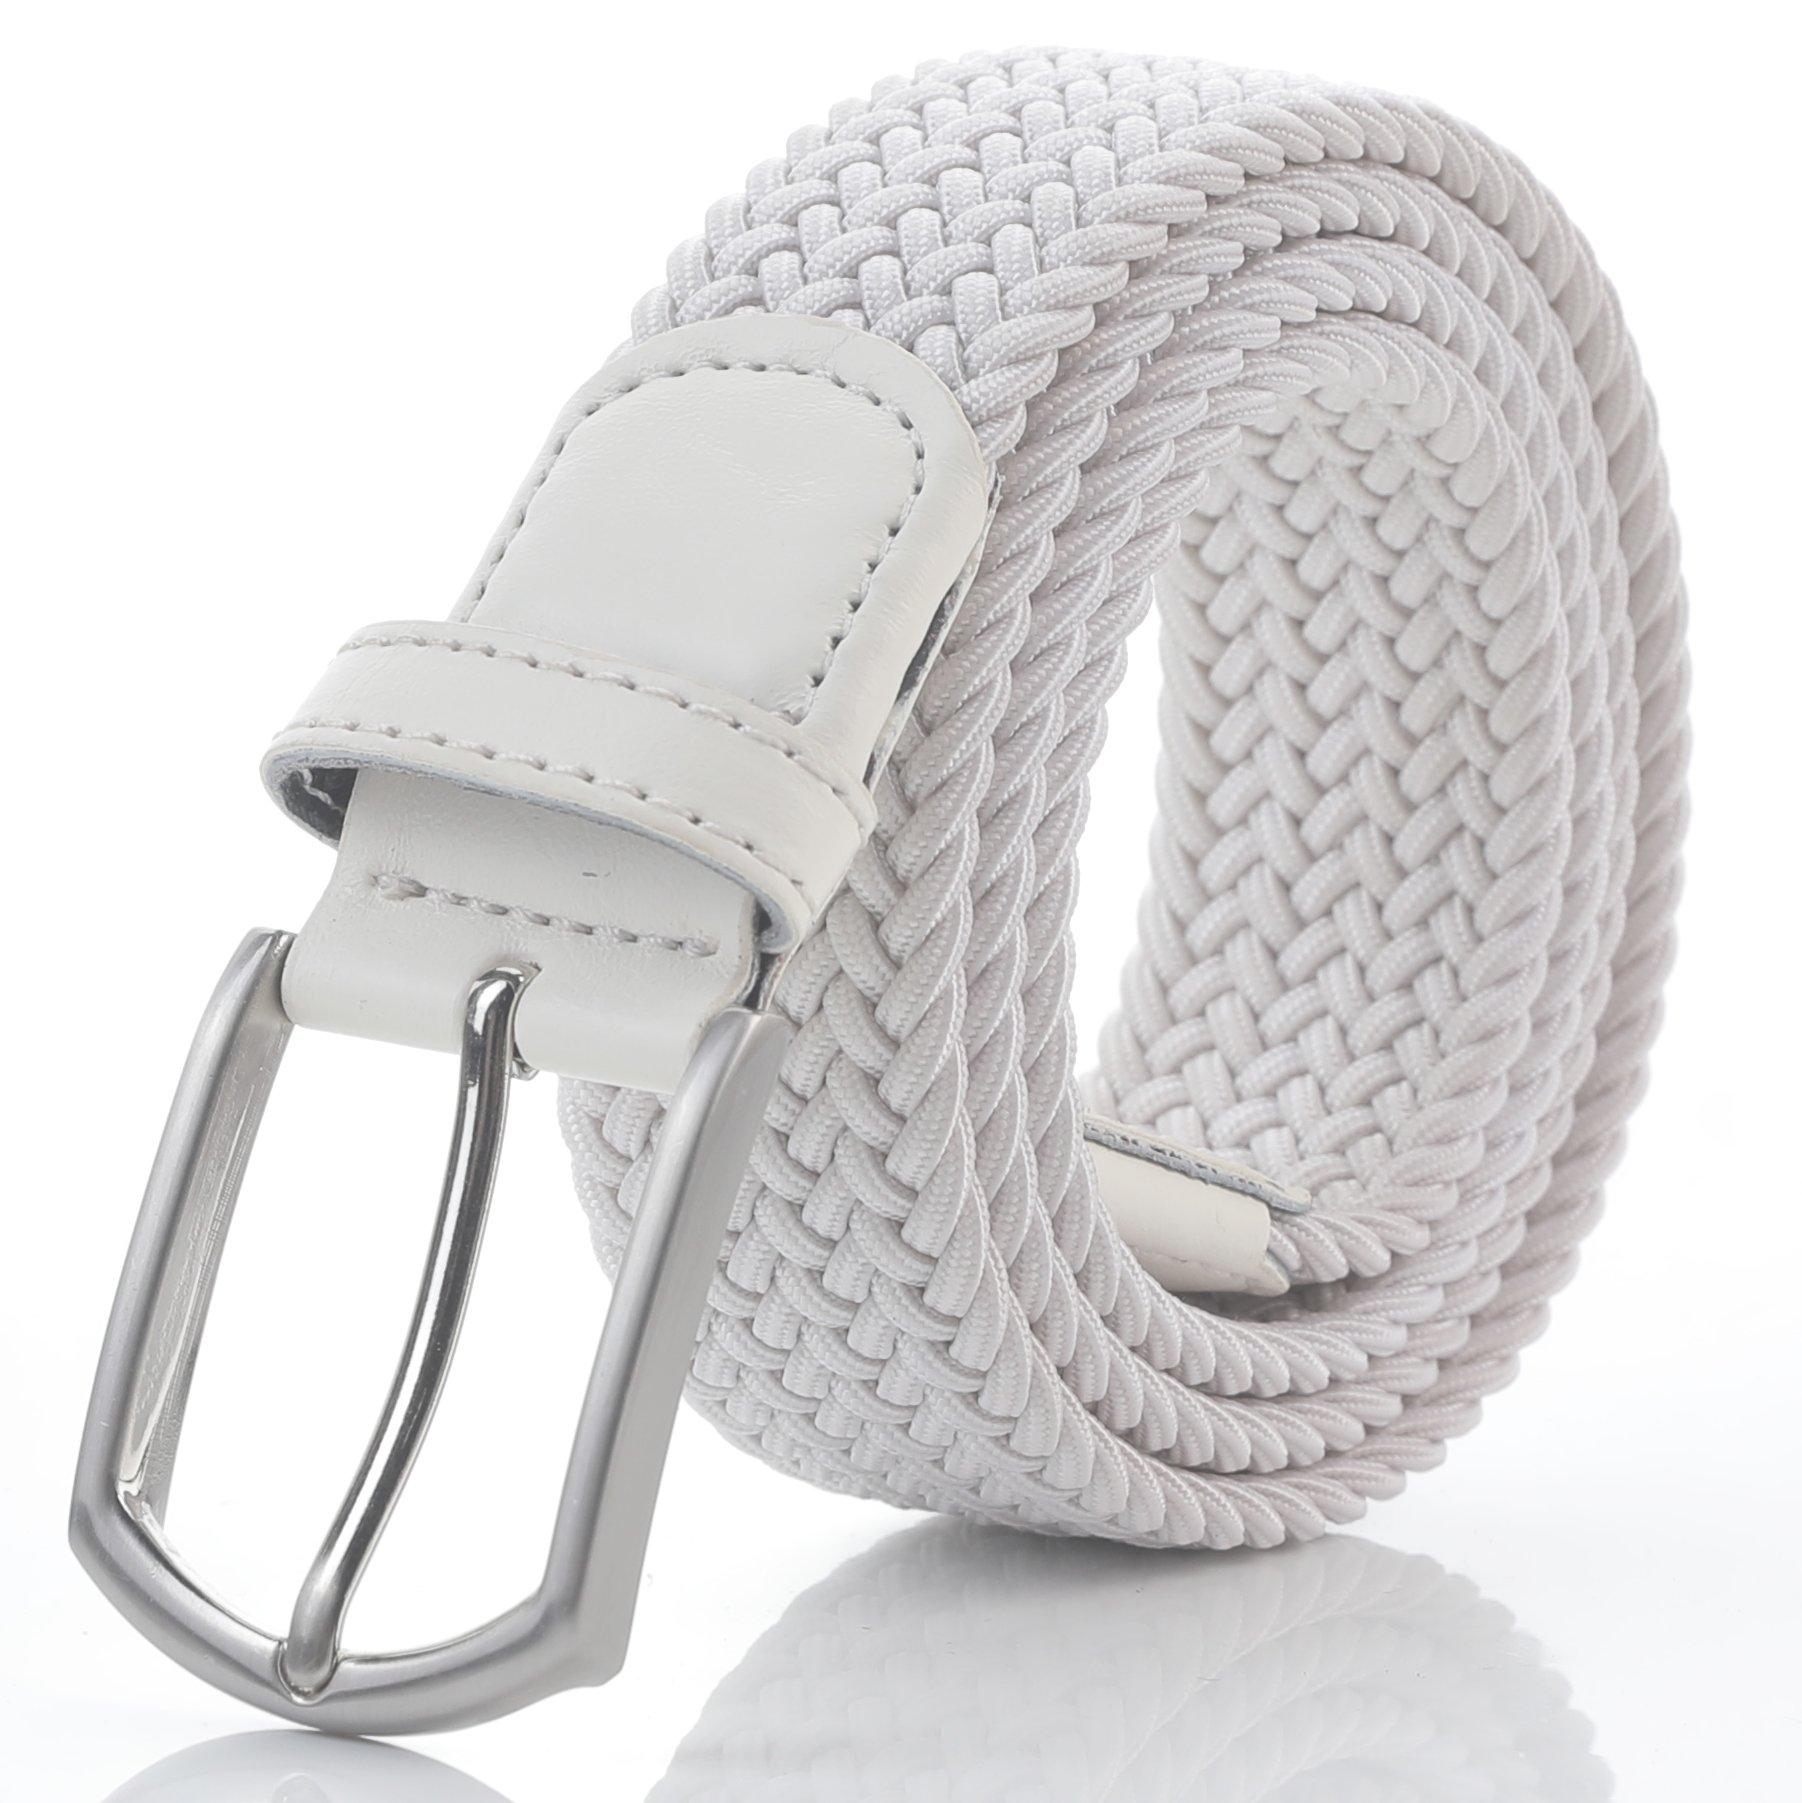 Weifert Men's Stretch Woven 1.3''Wide Elastic Braided Belts (34-37, White)